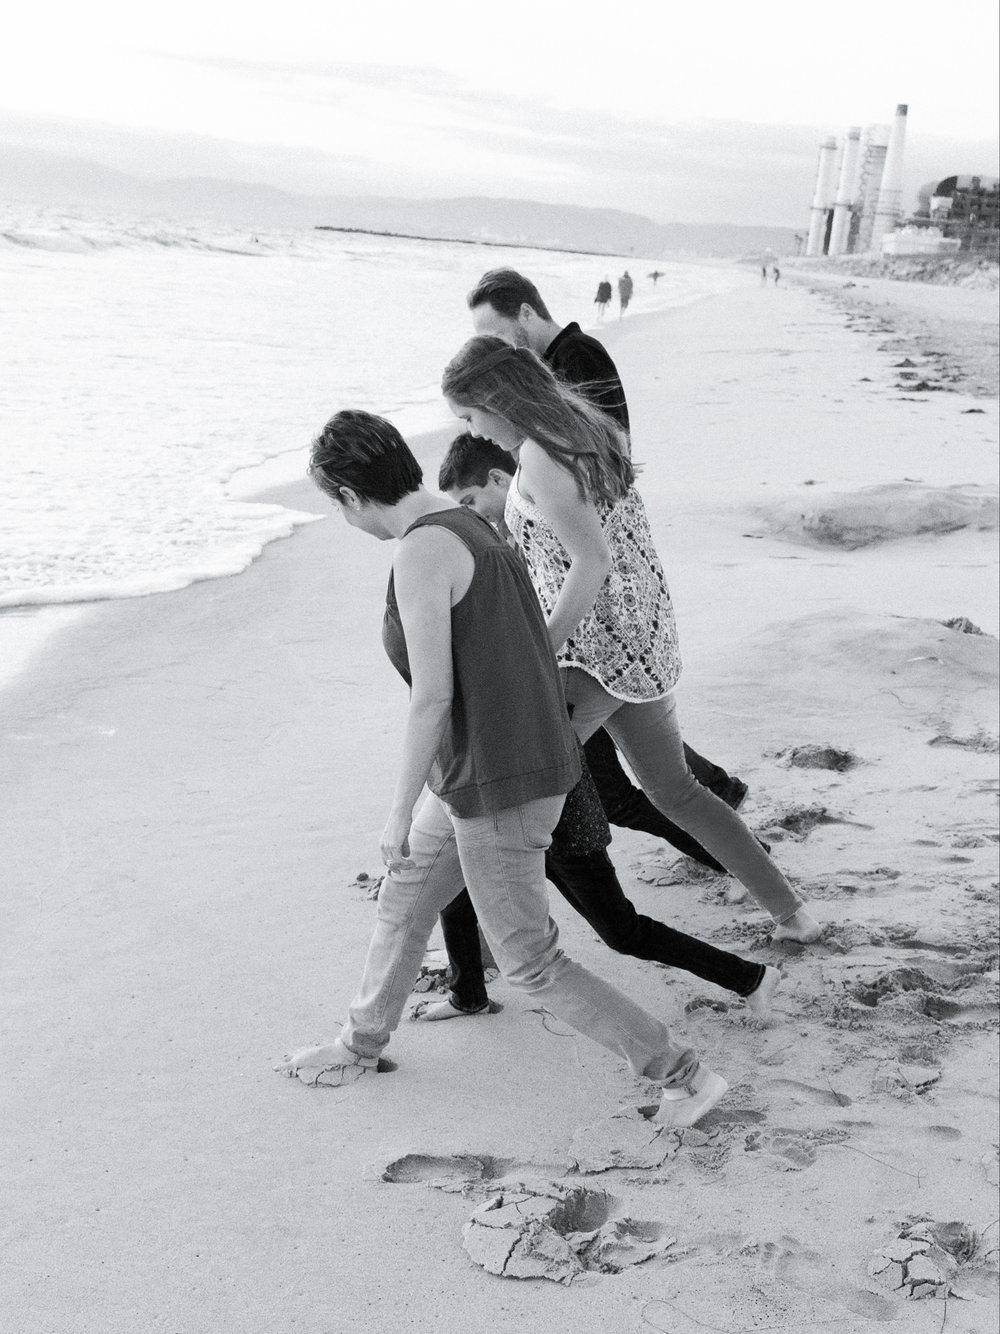 El Porto Manhattan Beach Family Portrait Photographs and El Porto Manhattan Beach Family Portrait Photographs, El Porto Manhattan Beach Family Portrait Photographs, Photographer, El Porto Manhattan Beach Family Portrait Photographs from Fine Art Family Portrait Photographer, engagement photographer and Wedding Photographer Daniel Doty Photography.